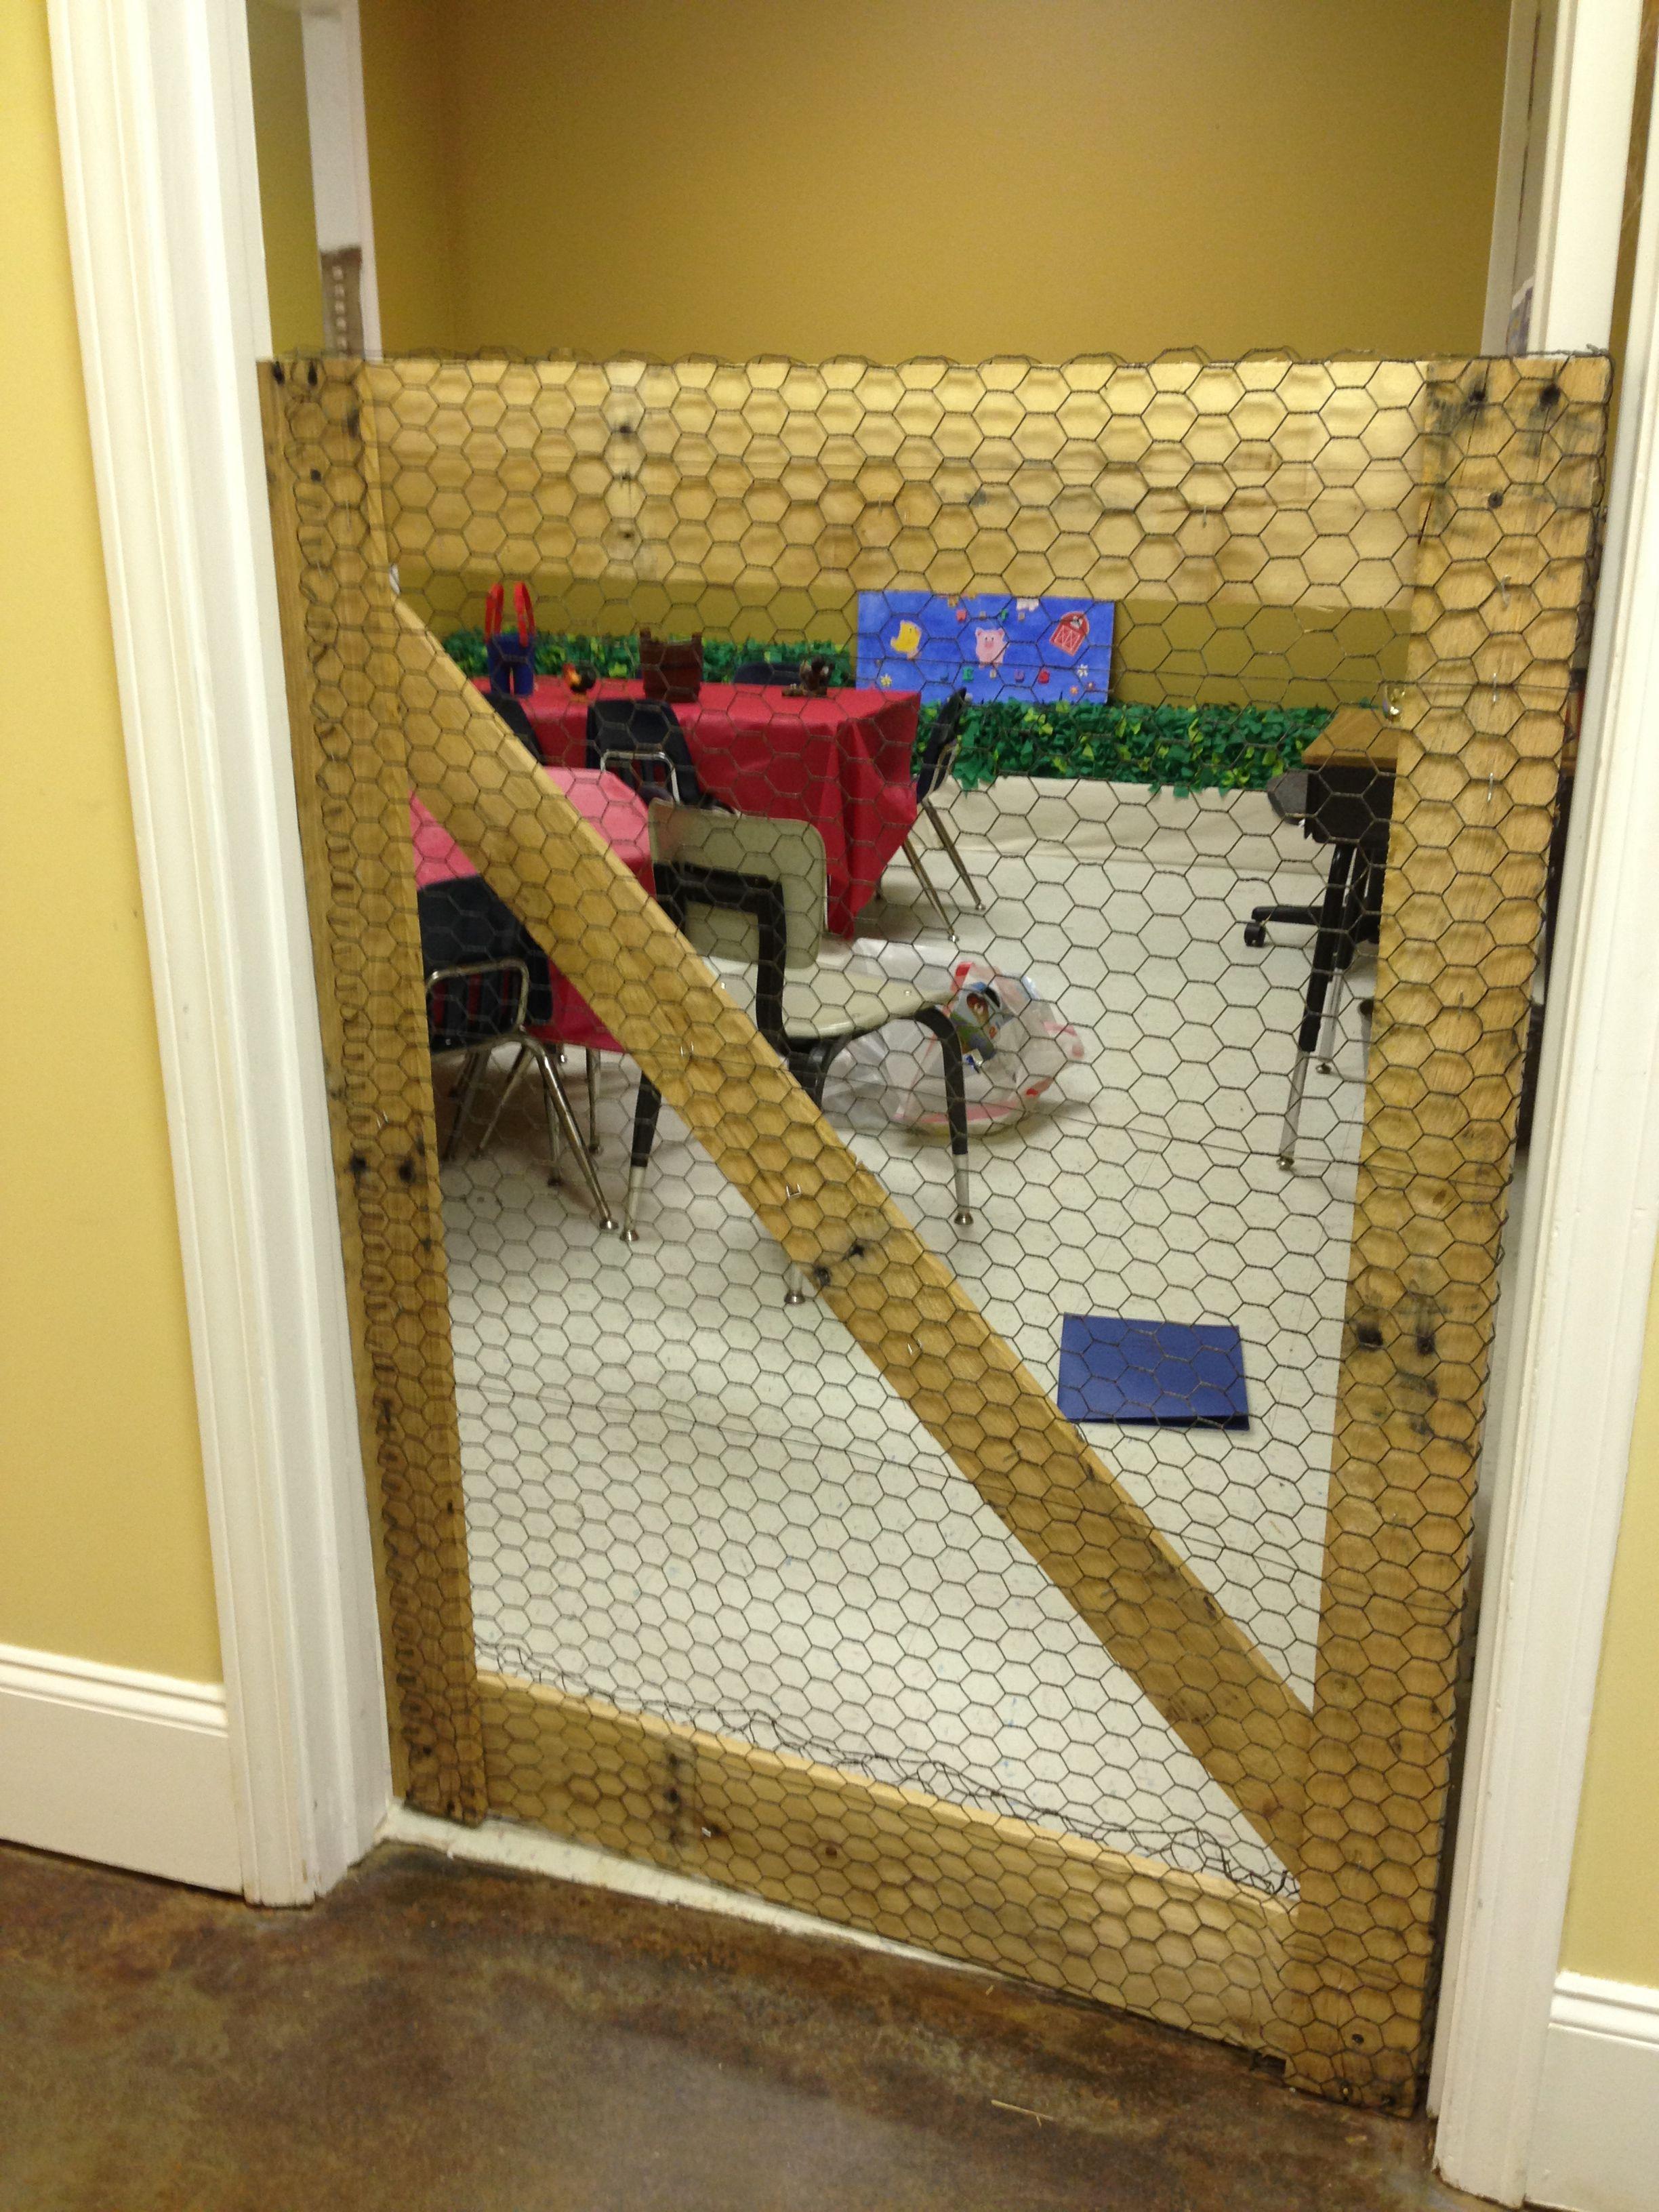 Preschool area chicken coop gate (used as their door